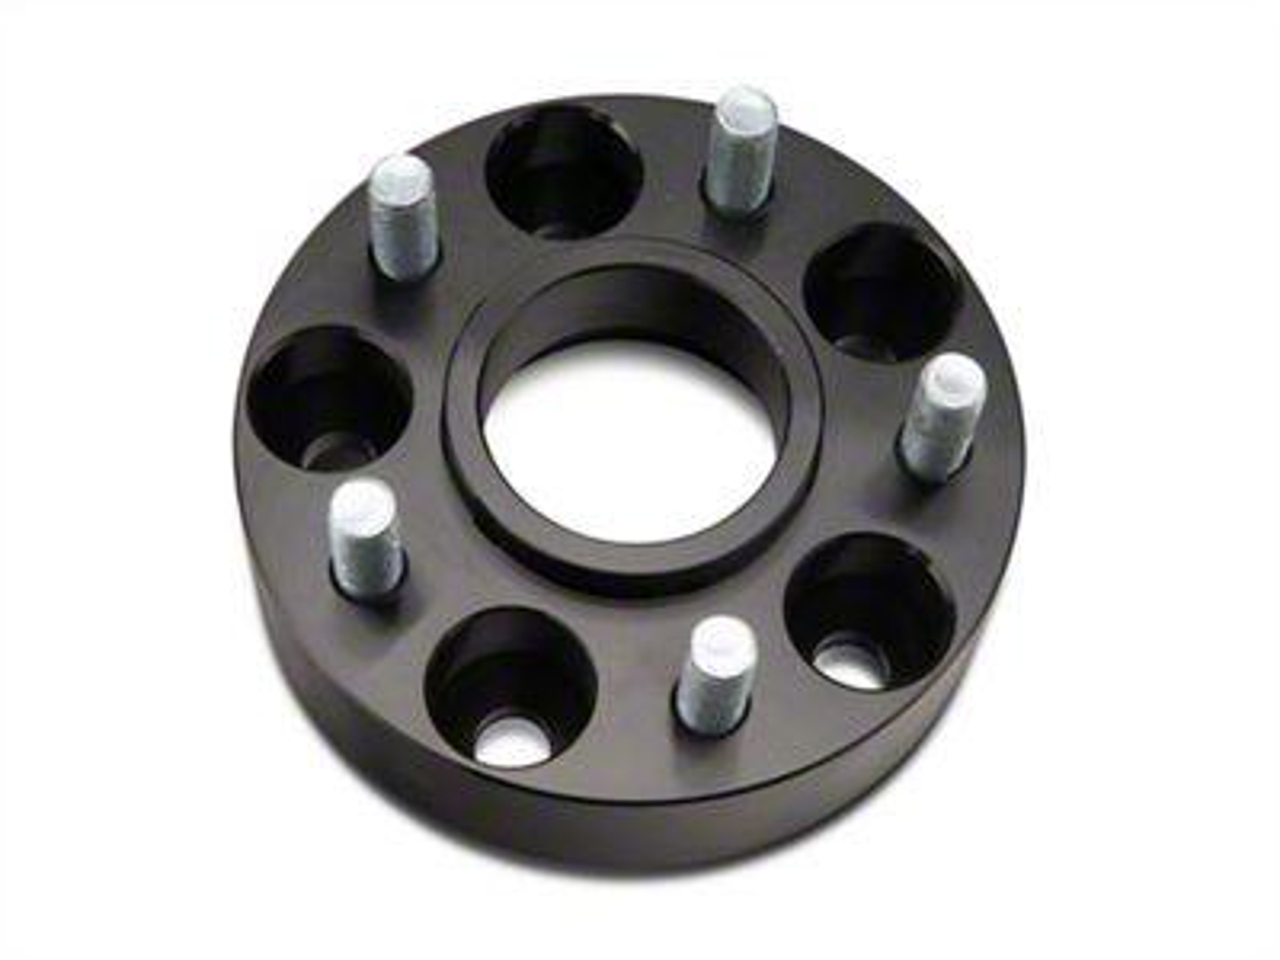 RedRock 4x4 1.5 in. Wheel Spacers - Black - 5x4.5 Bolt Pattern (87-06 Jeep Wrangler YJ & TJ)